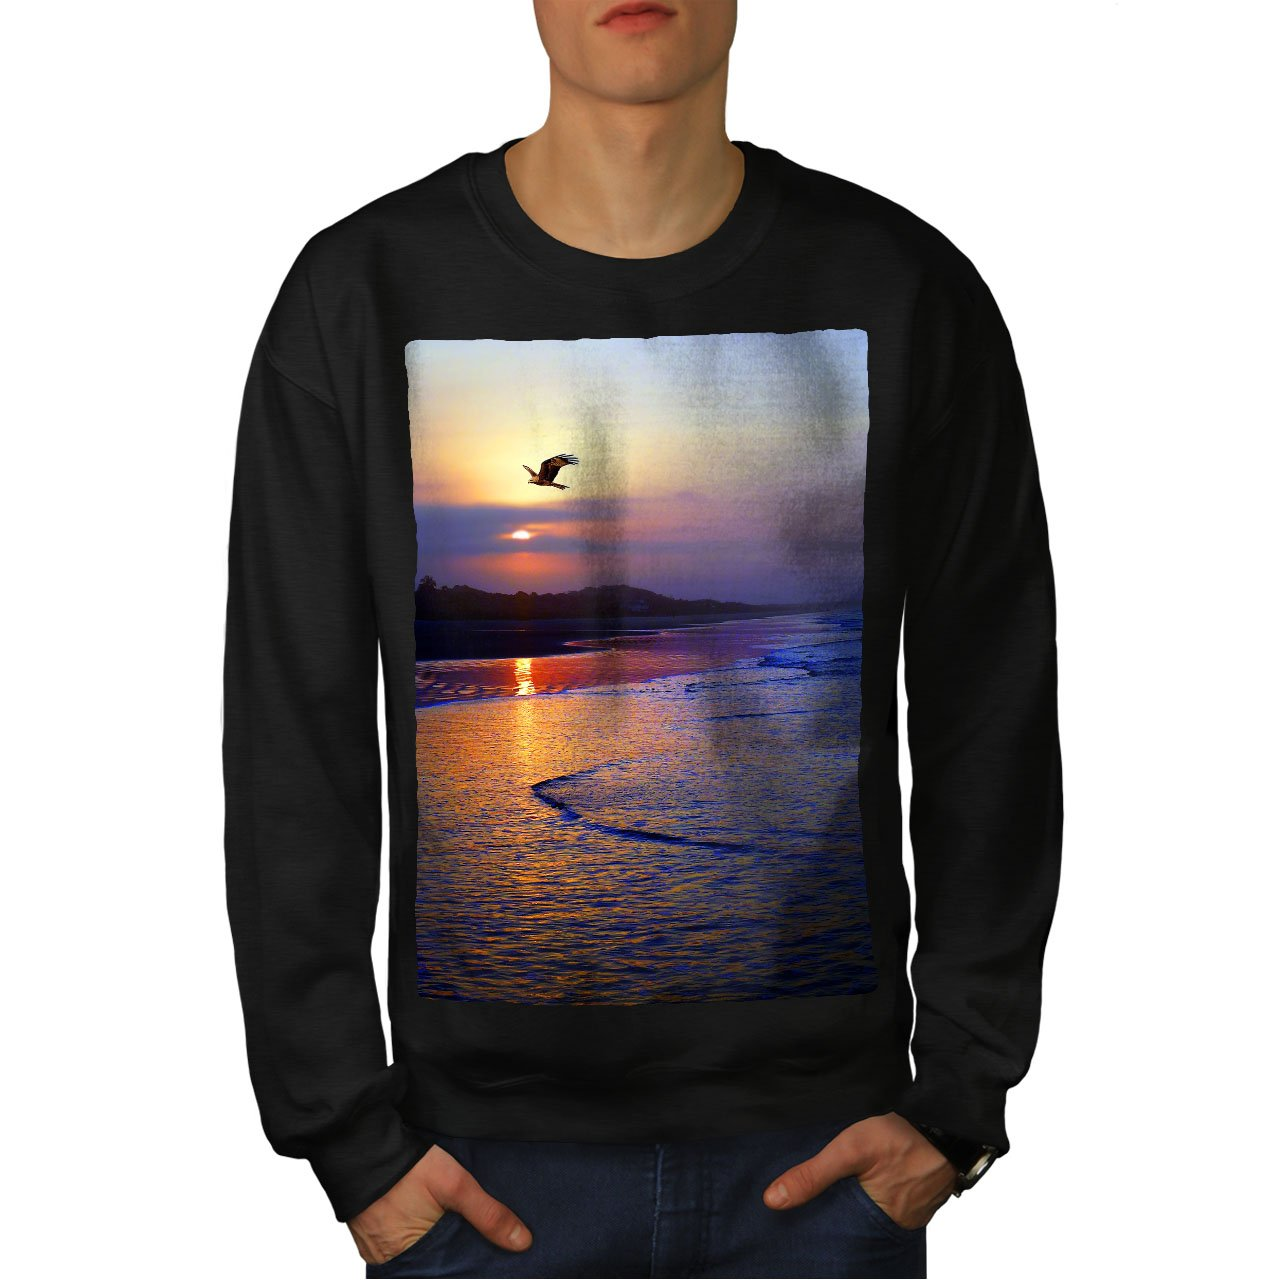 wellcoda Beach Sunset Photo Mens Sweatshirt Late Casual Jumper